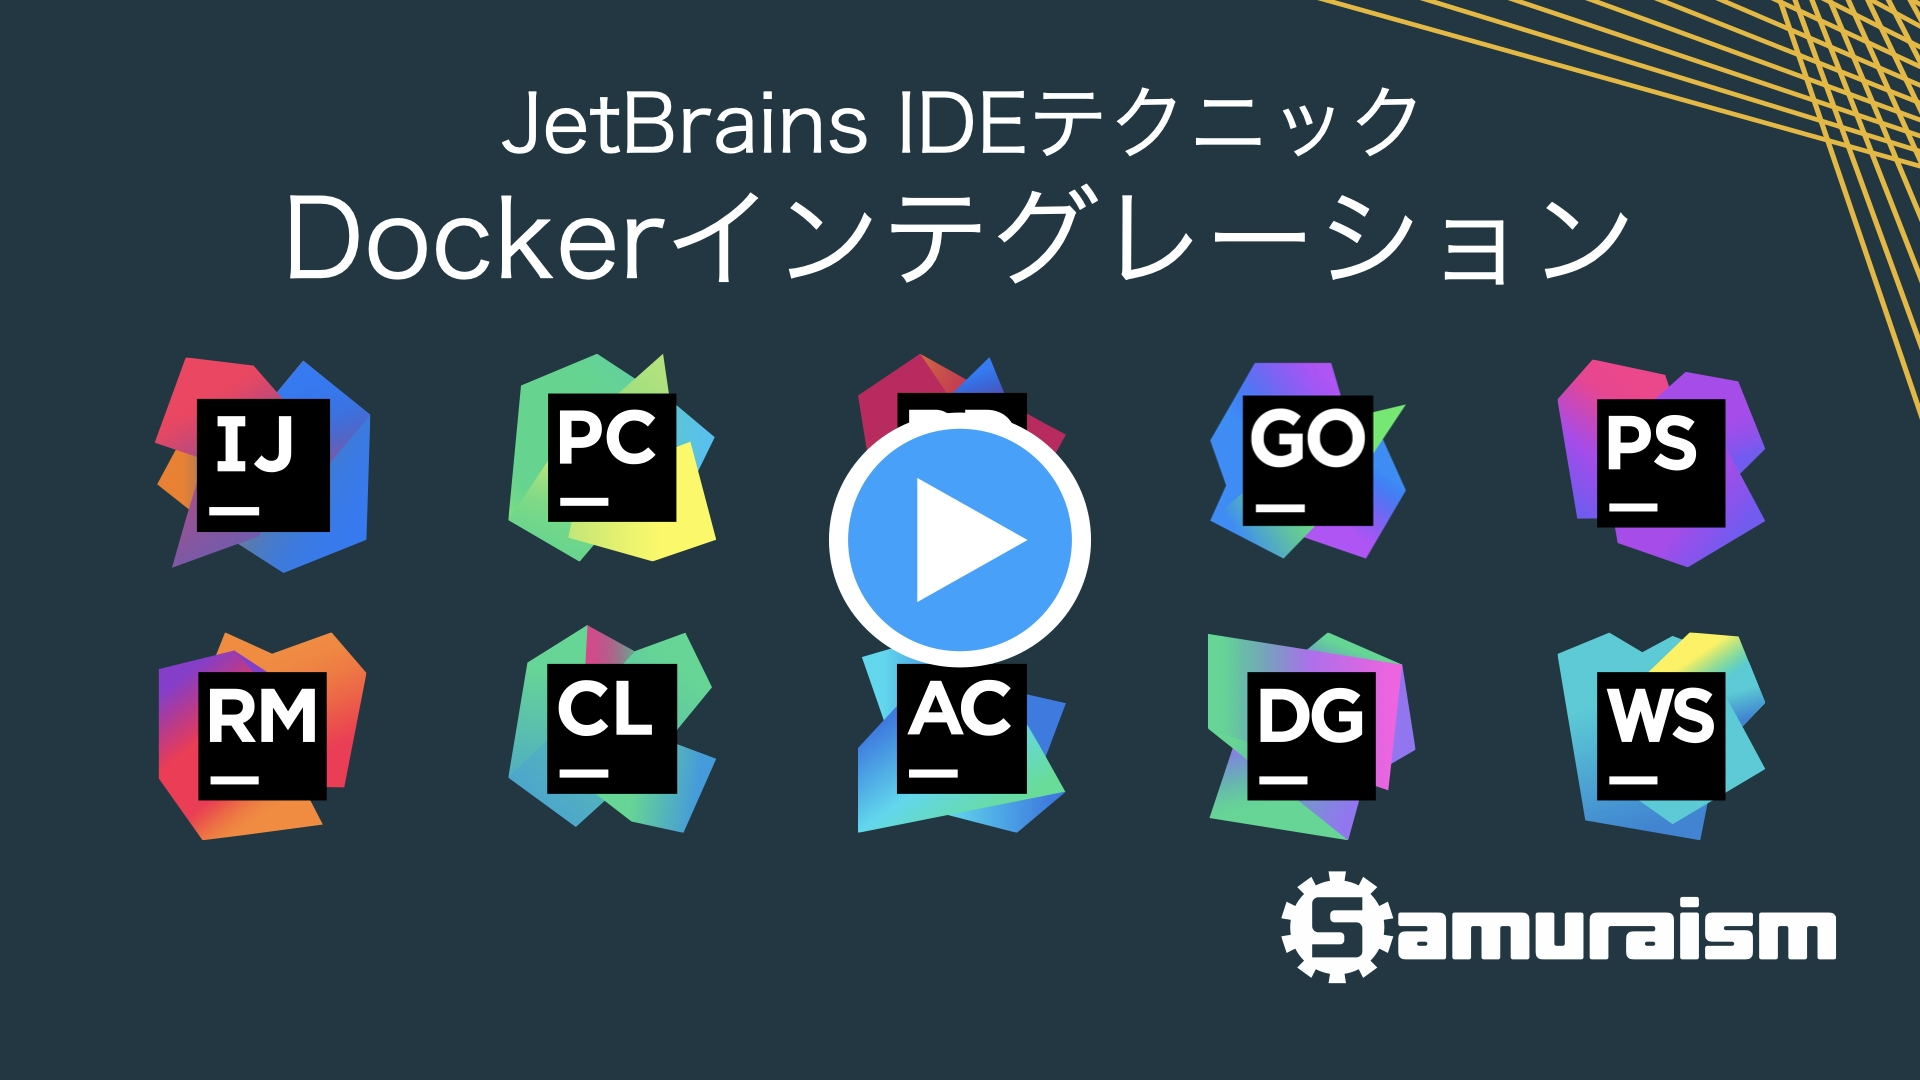 #JetBrainsIDEテクニック – Dockerインテグレーション